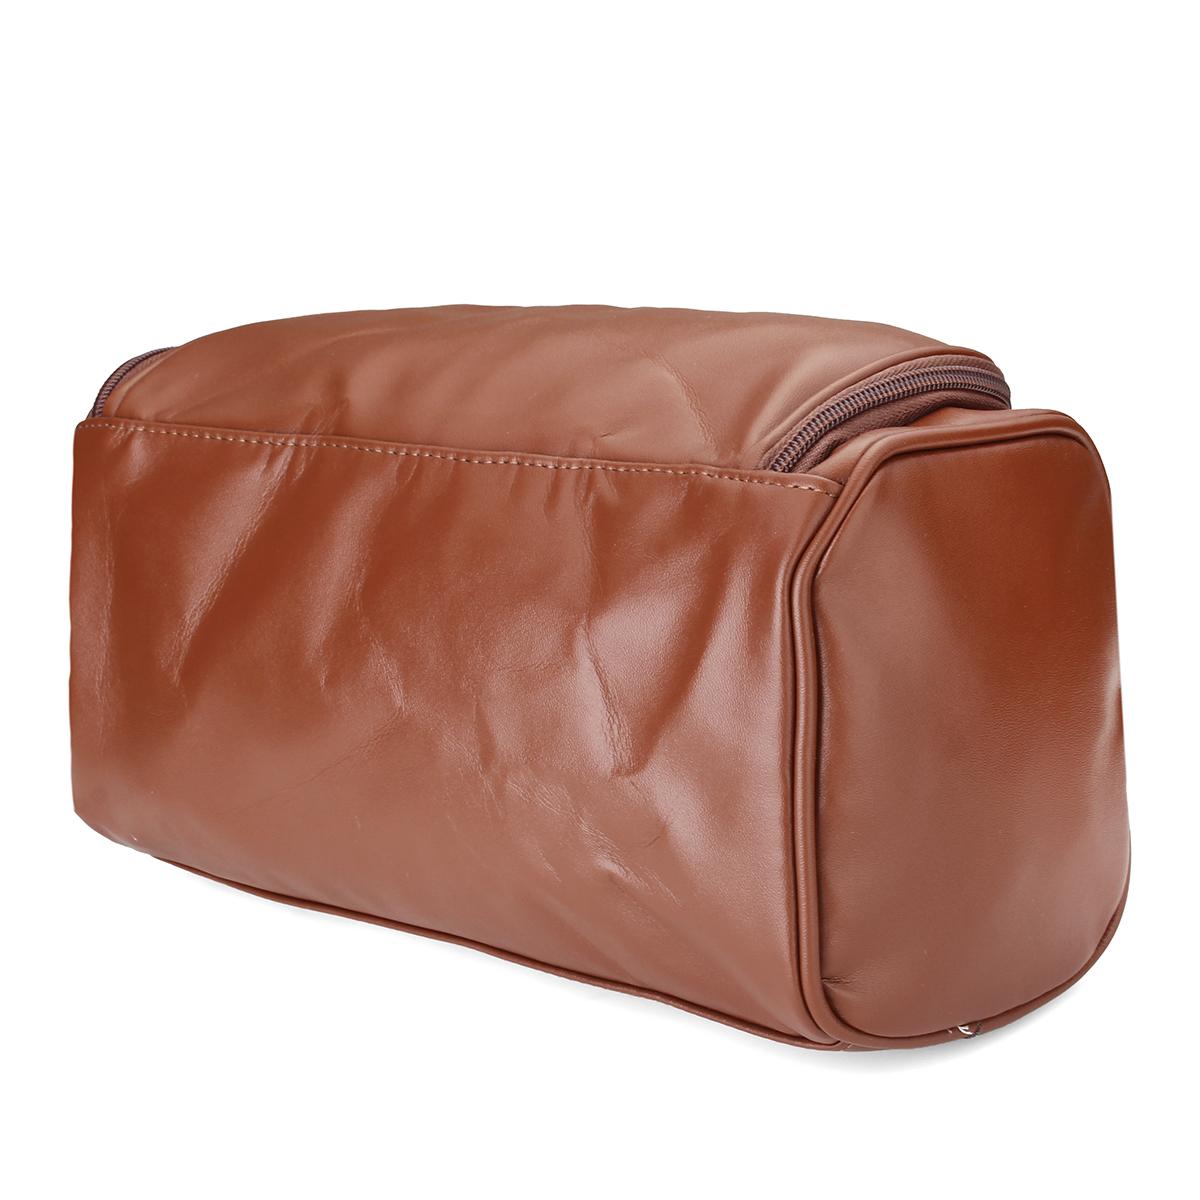 Leather Toiletry Bag Men Large Shaving Brush Cosmetic Travel